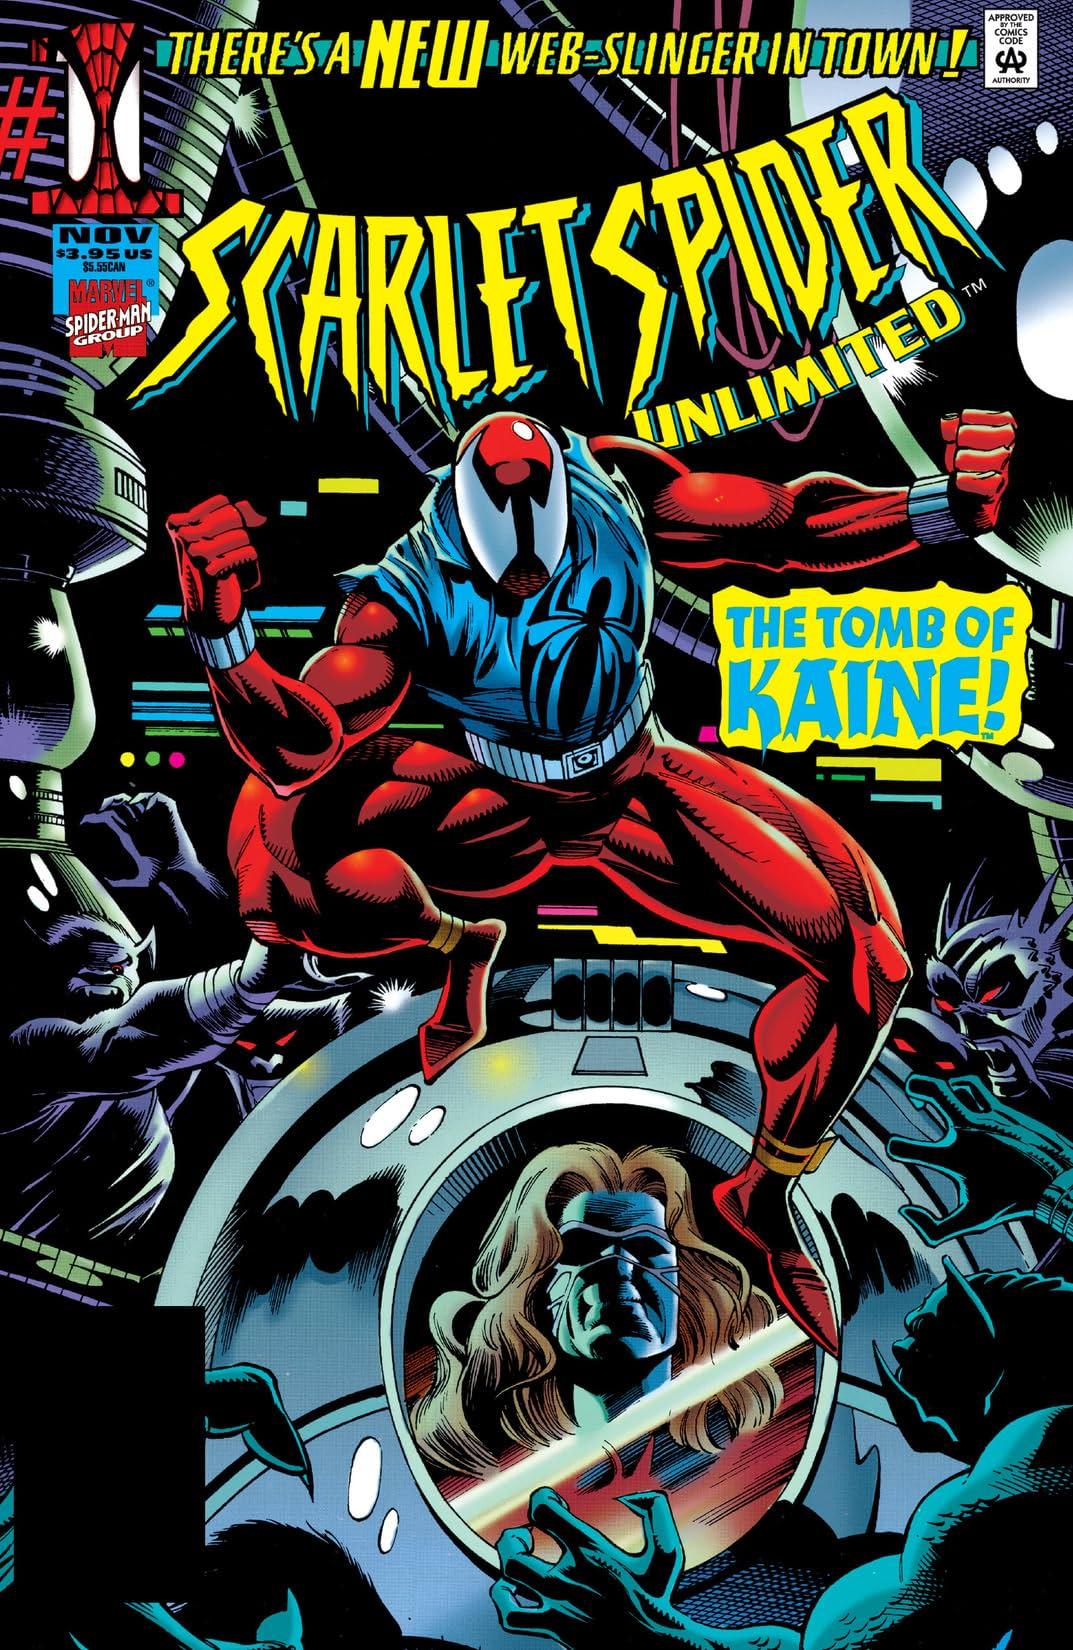 Scarlet Spider Unlimited (1995) #1